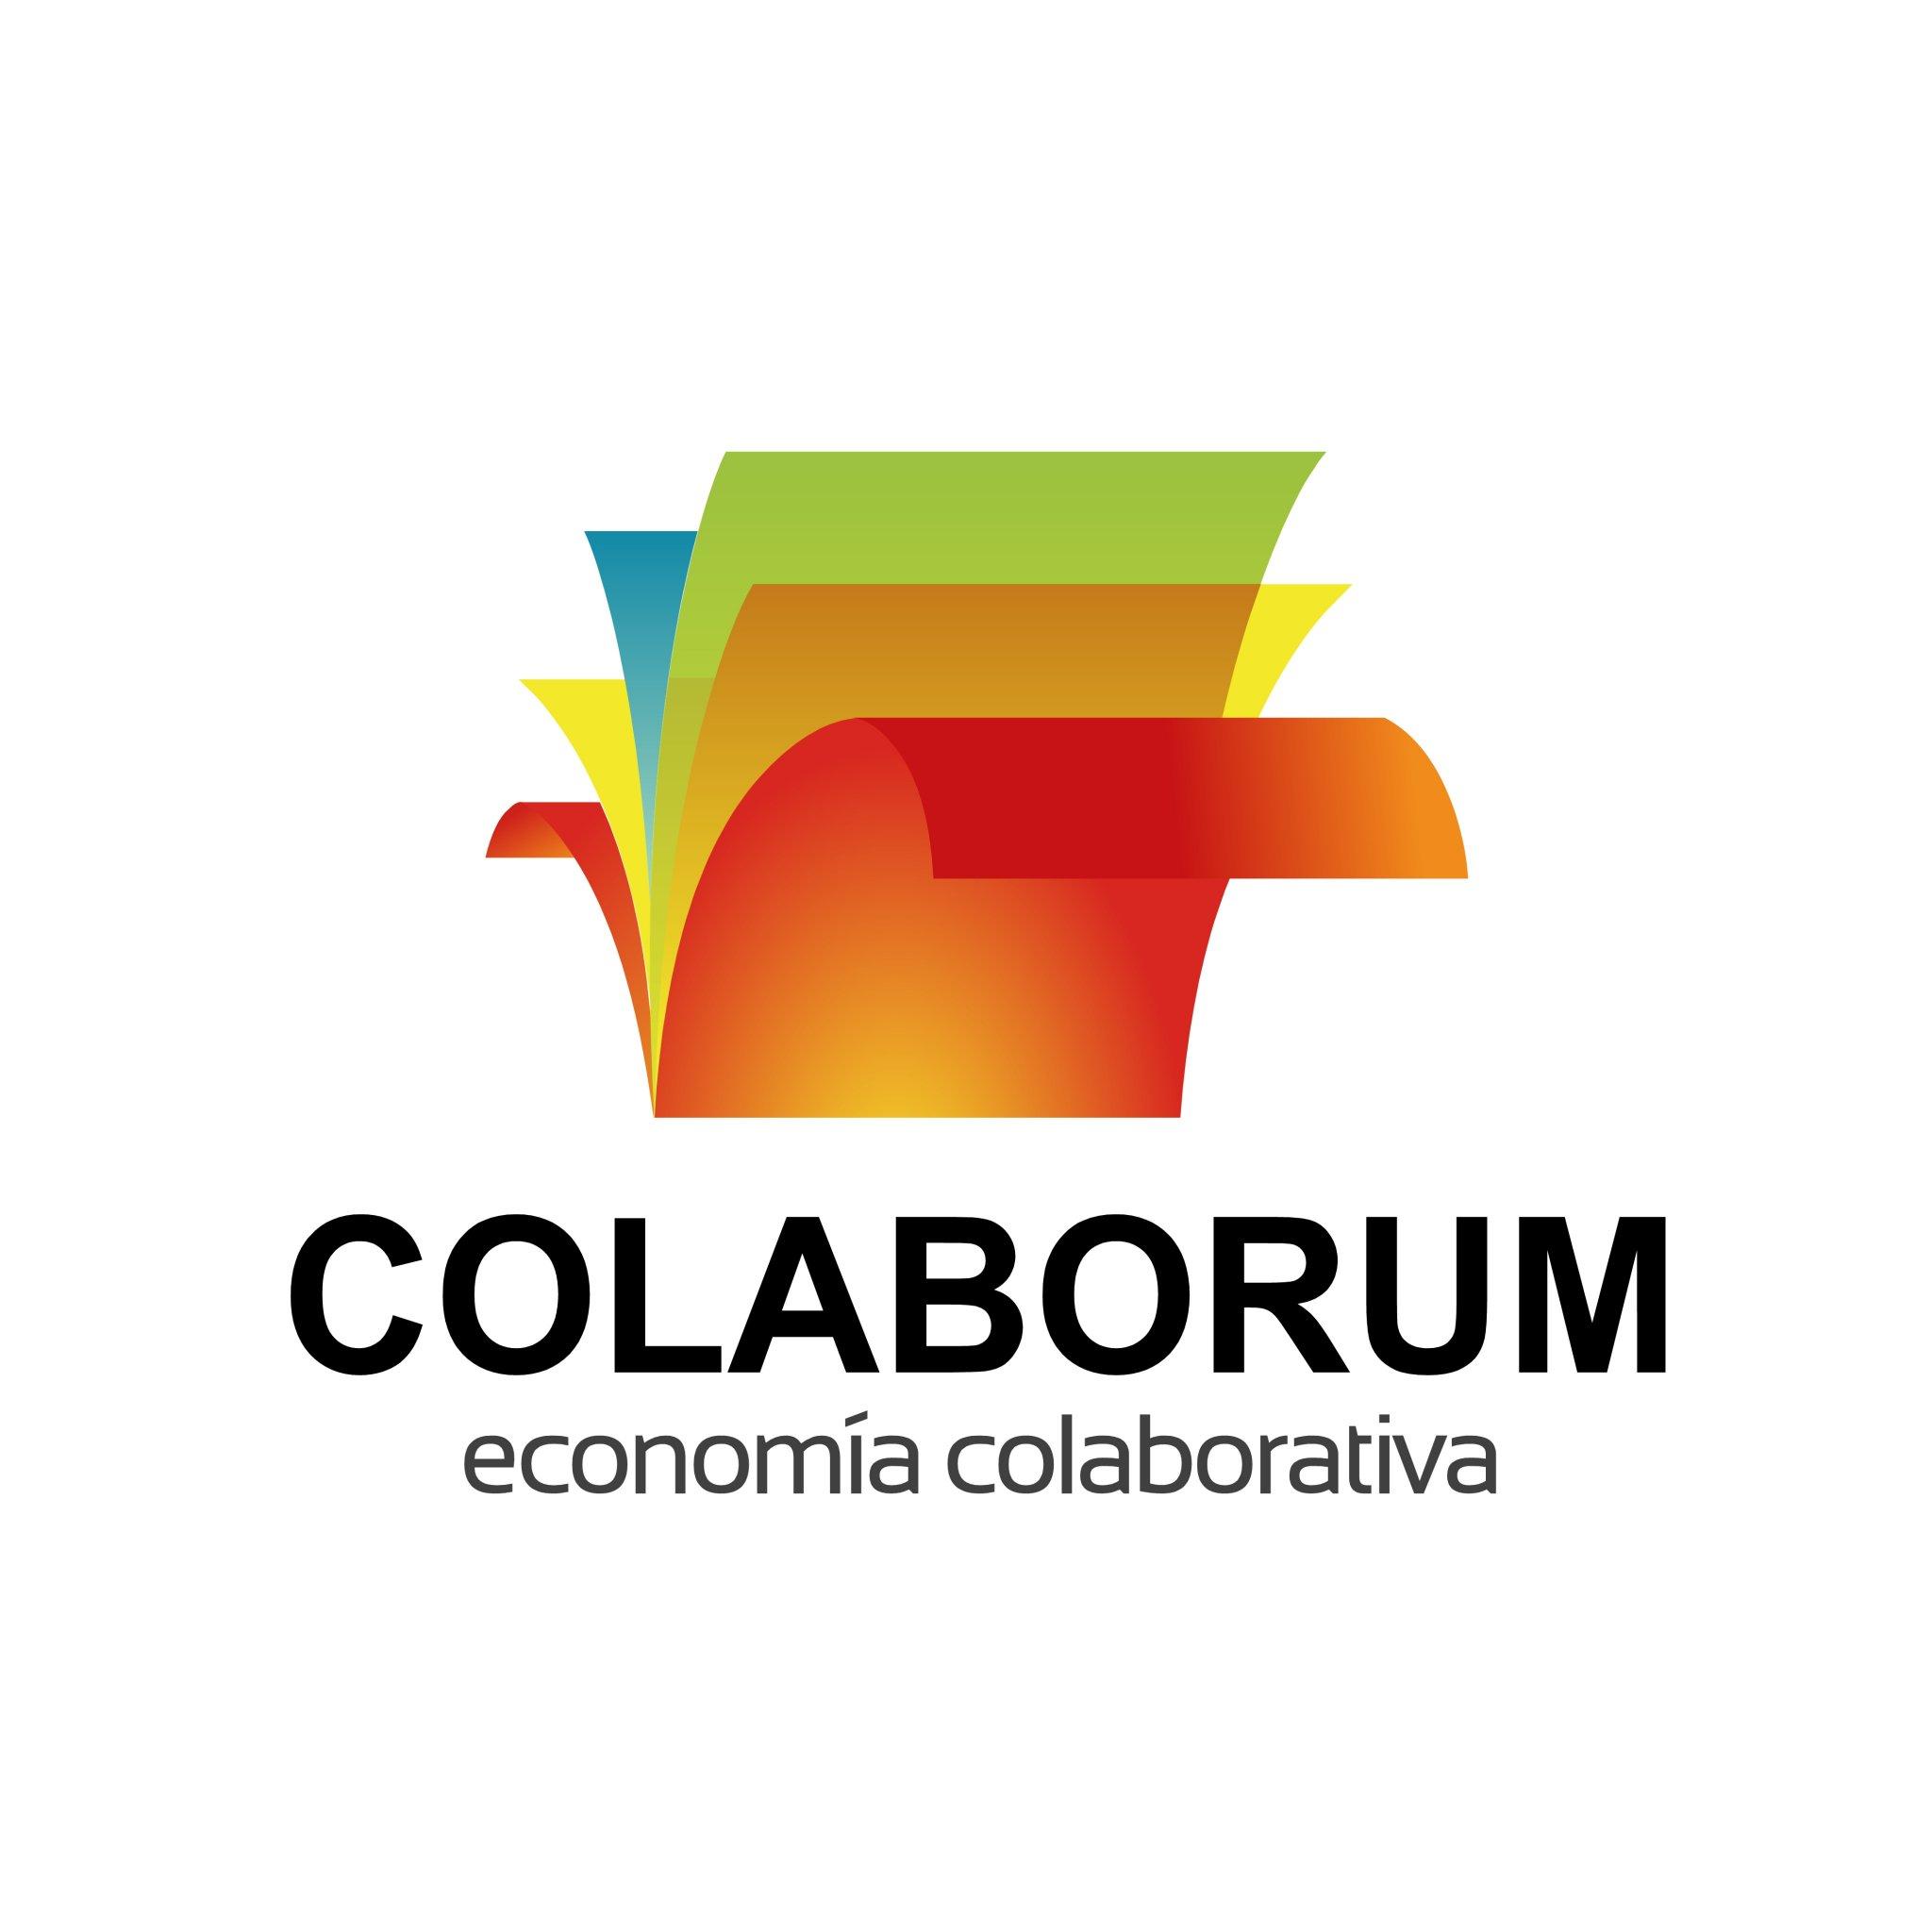 colaborum.info